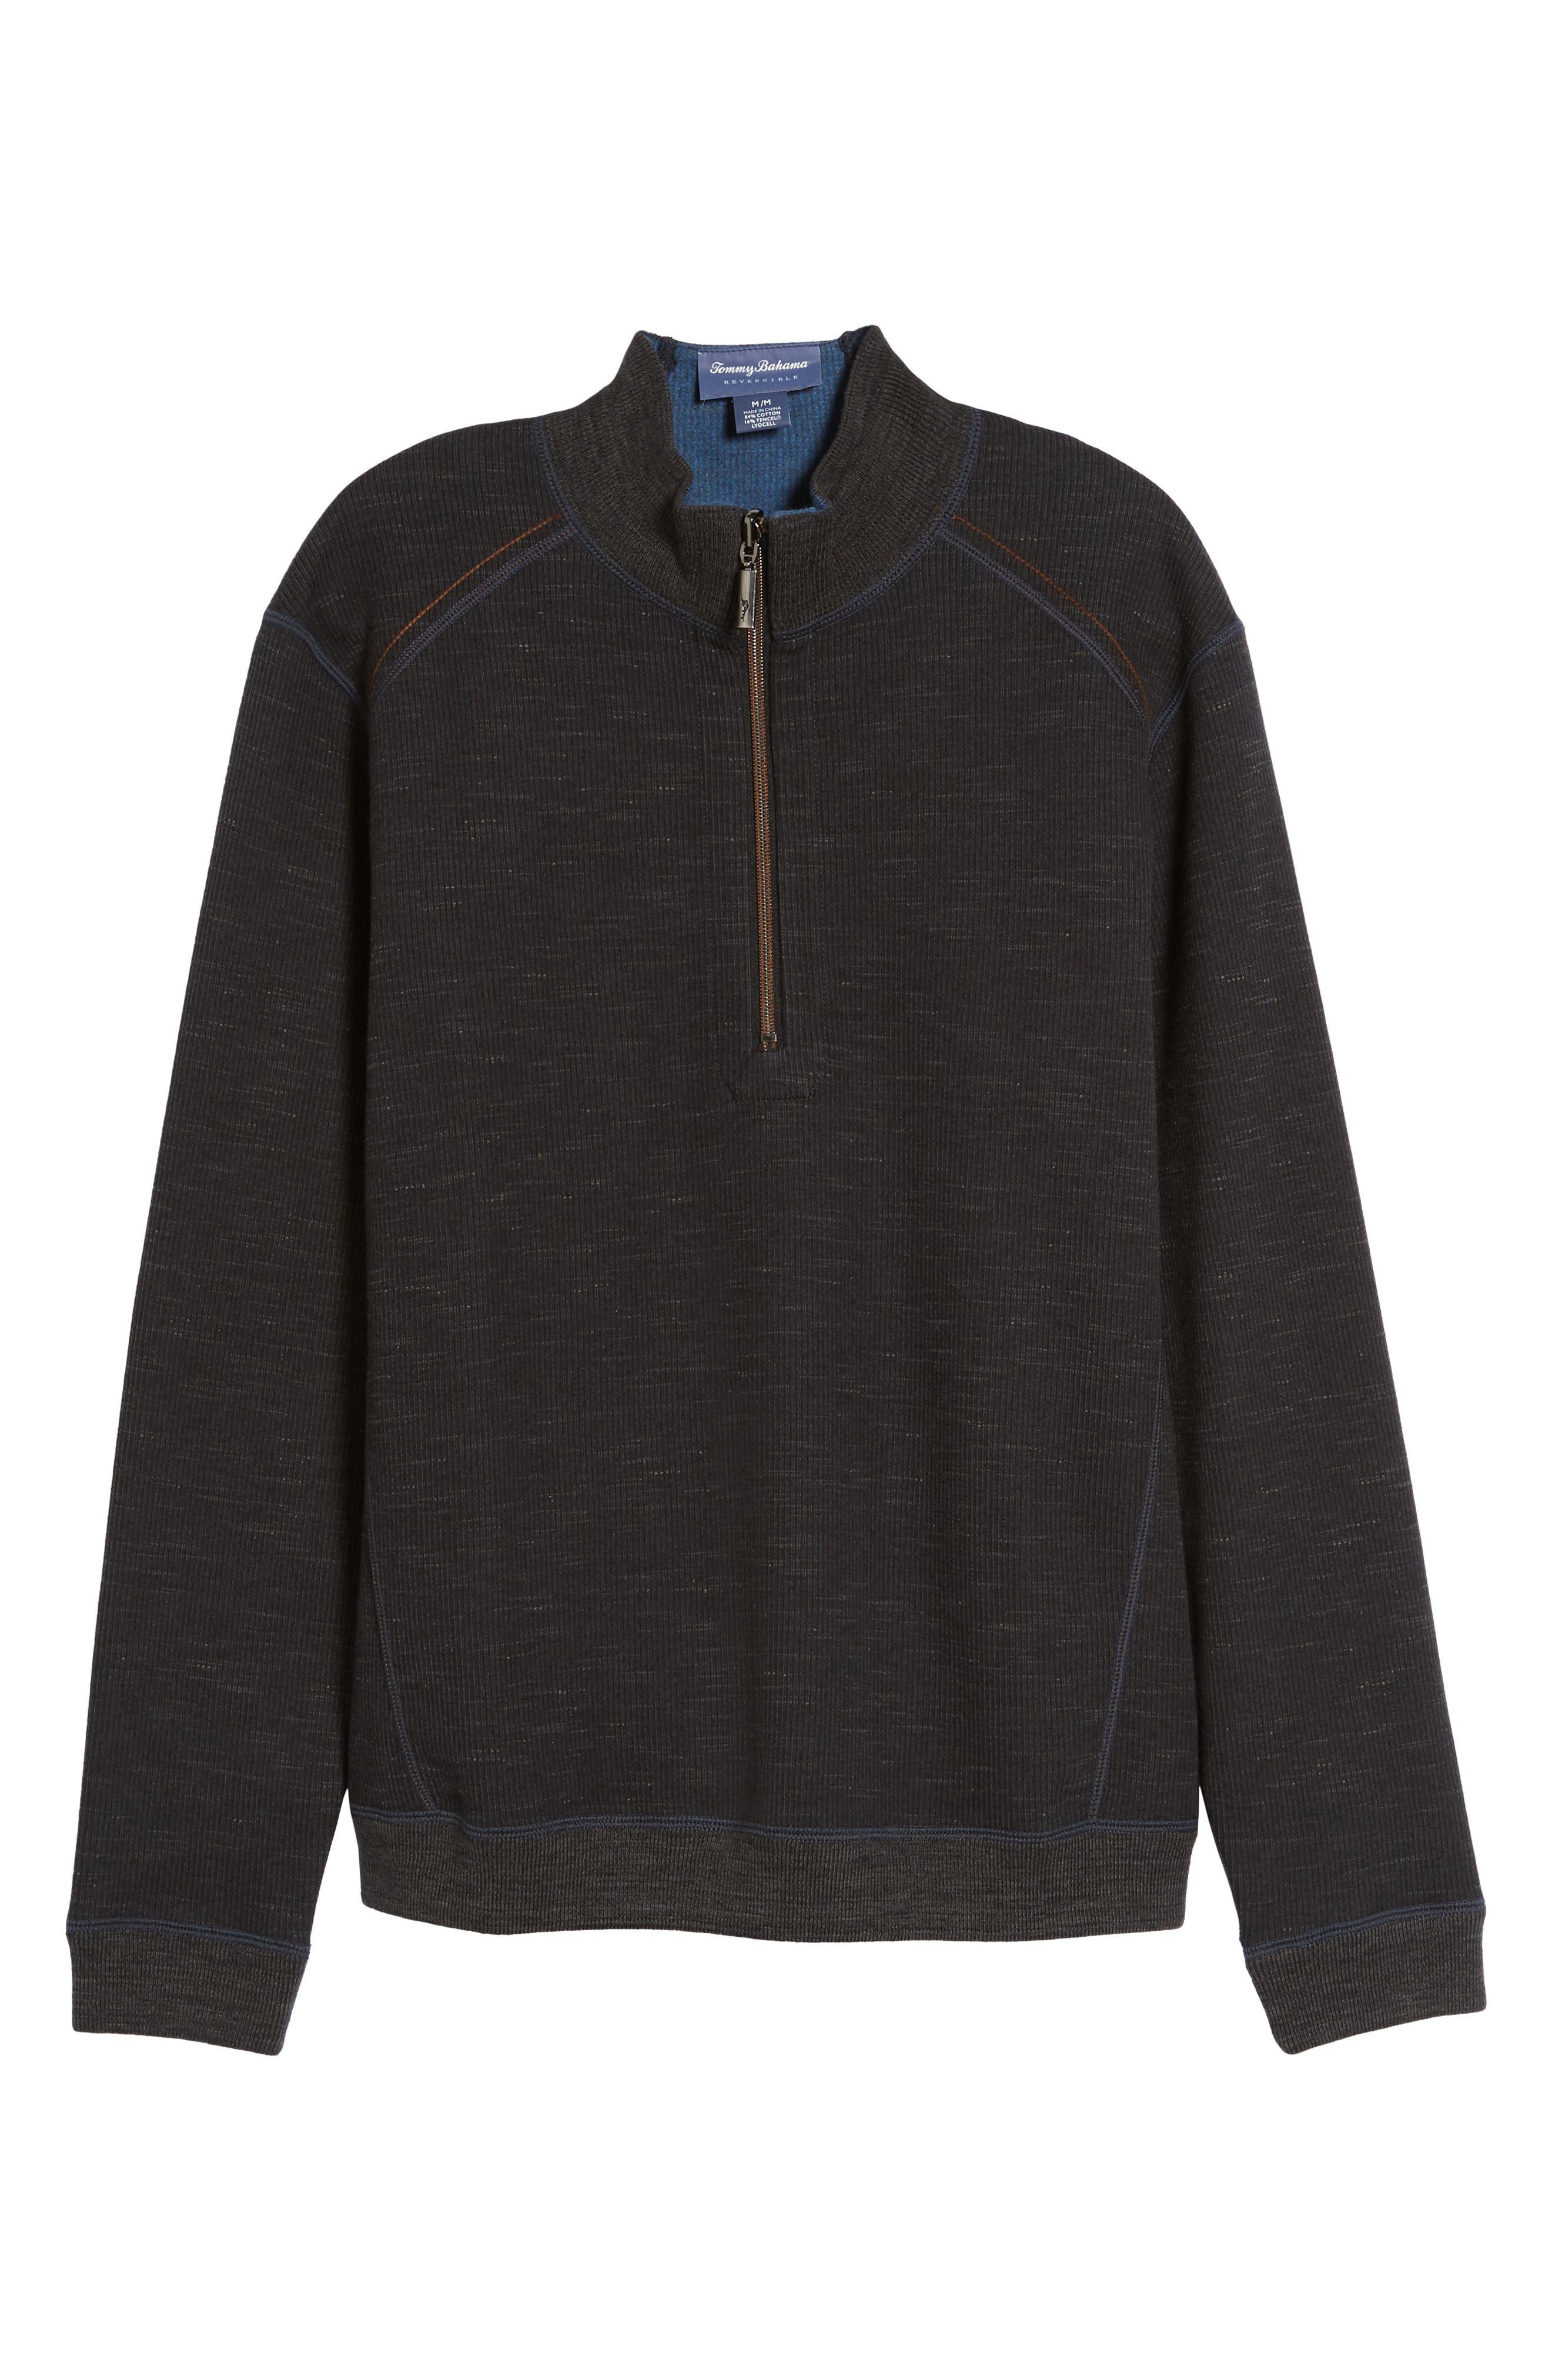 Flipsider Half Zip Reversible Sweatshirt,                             Alternate thumbnail 6, color,                             003